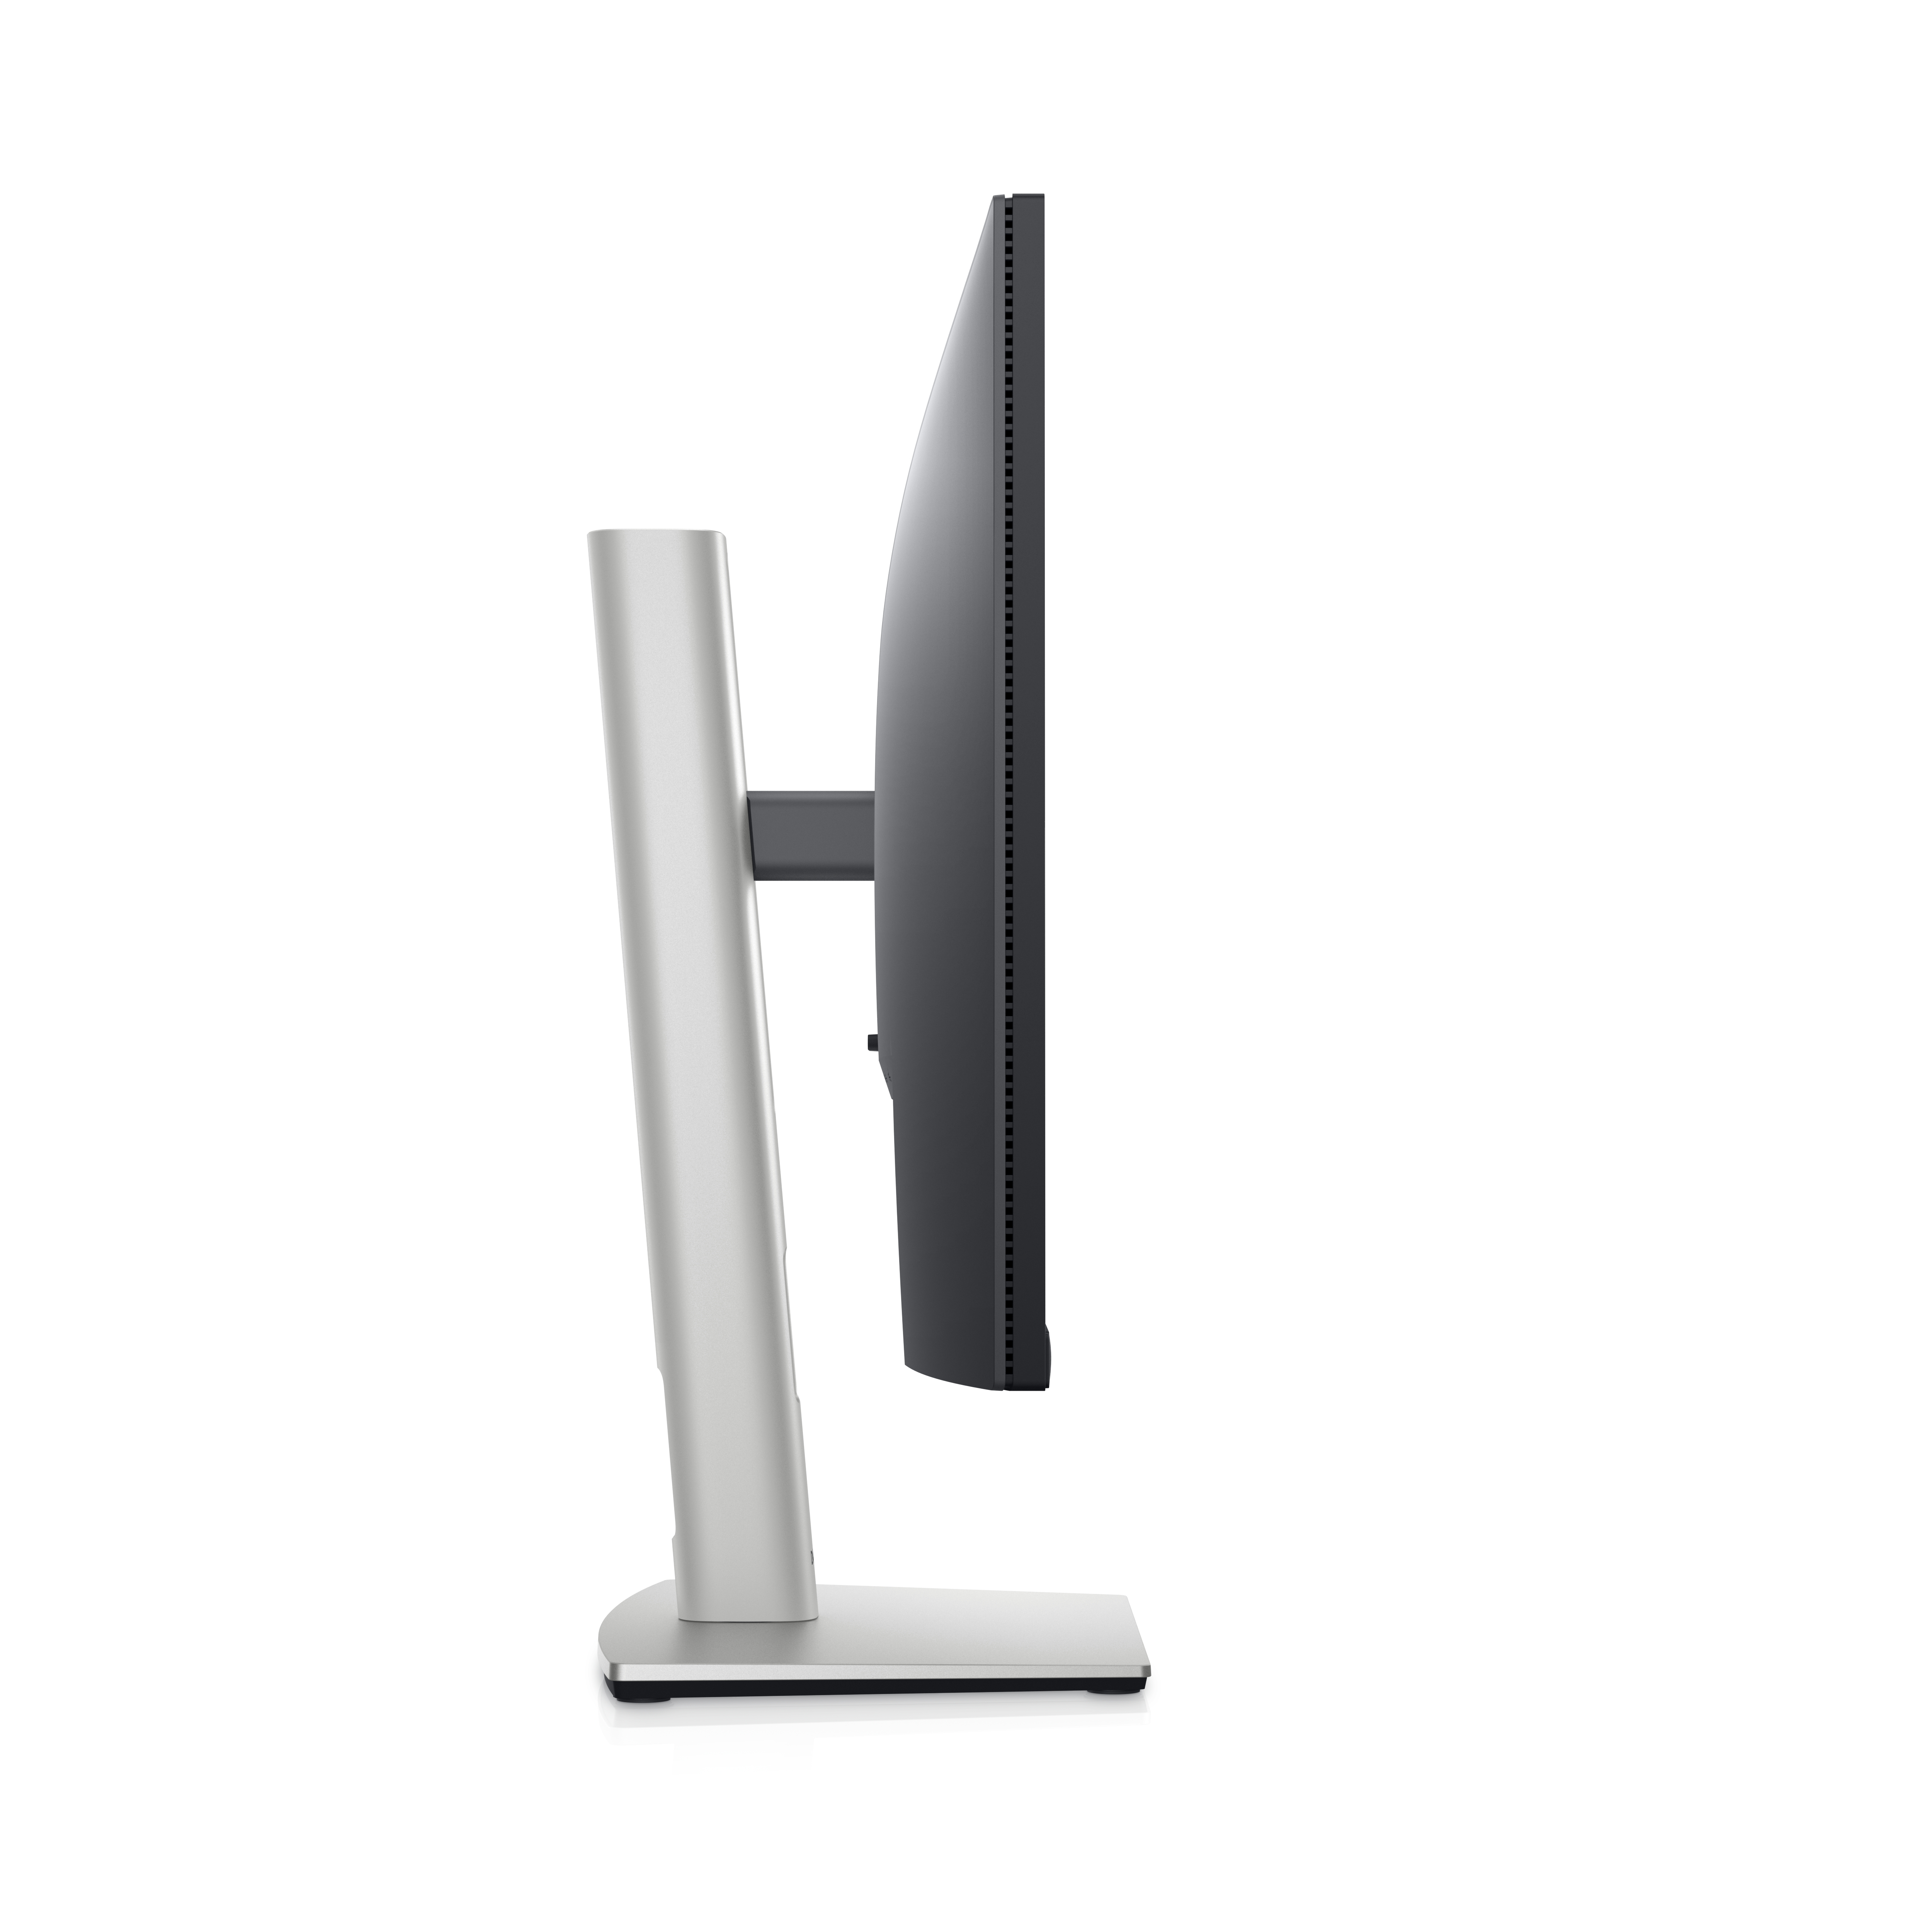 "Dell P2422HE - LED-Monitor - 60.47 cm (23.8"") - 1920 x 1080 Full HD (1080p)"